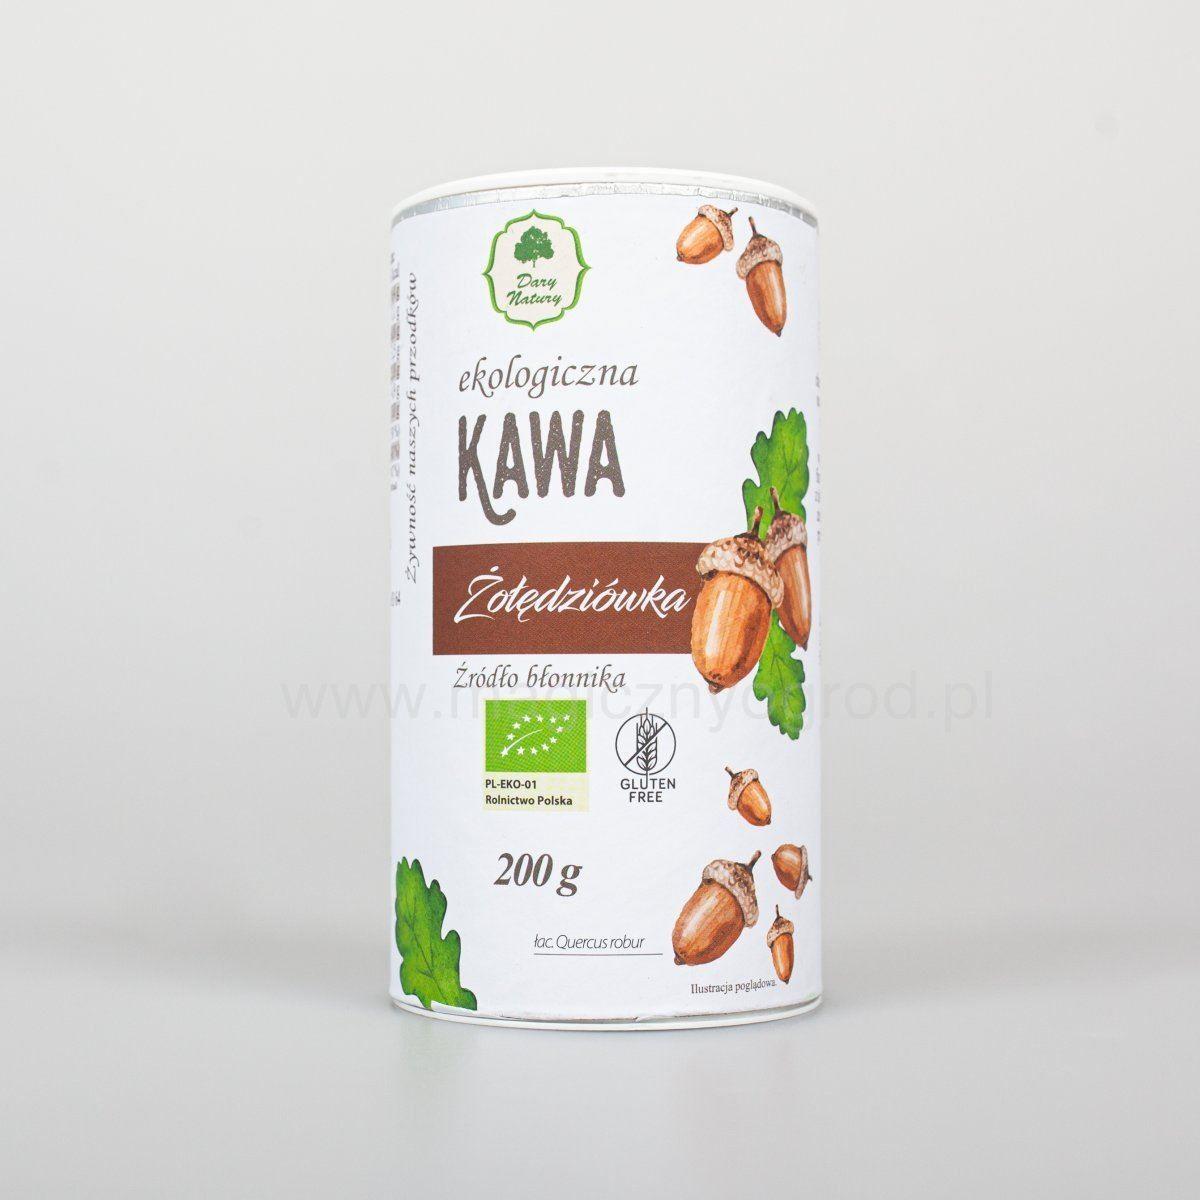 Kawa żołędziówka 200g EKO